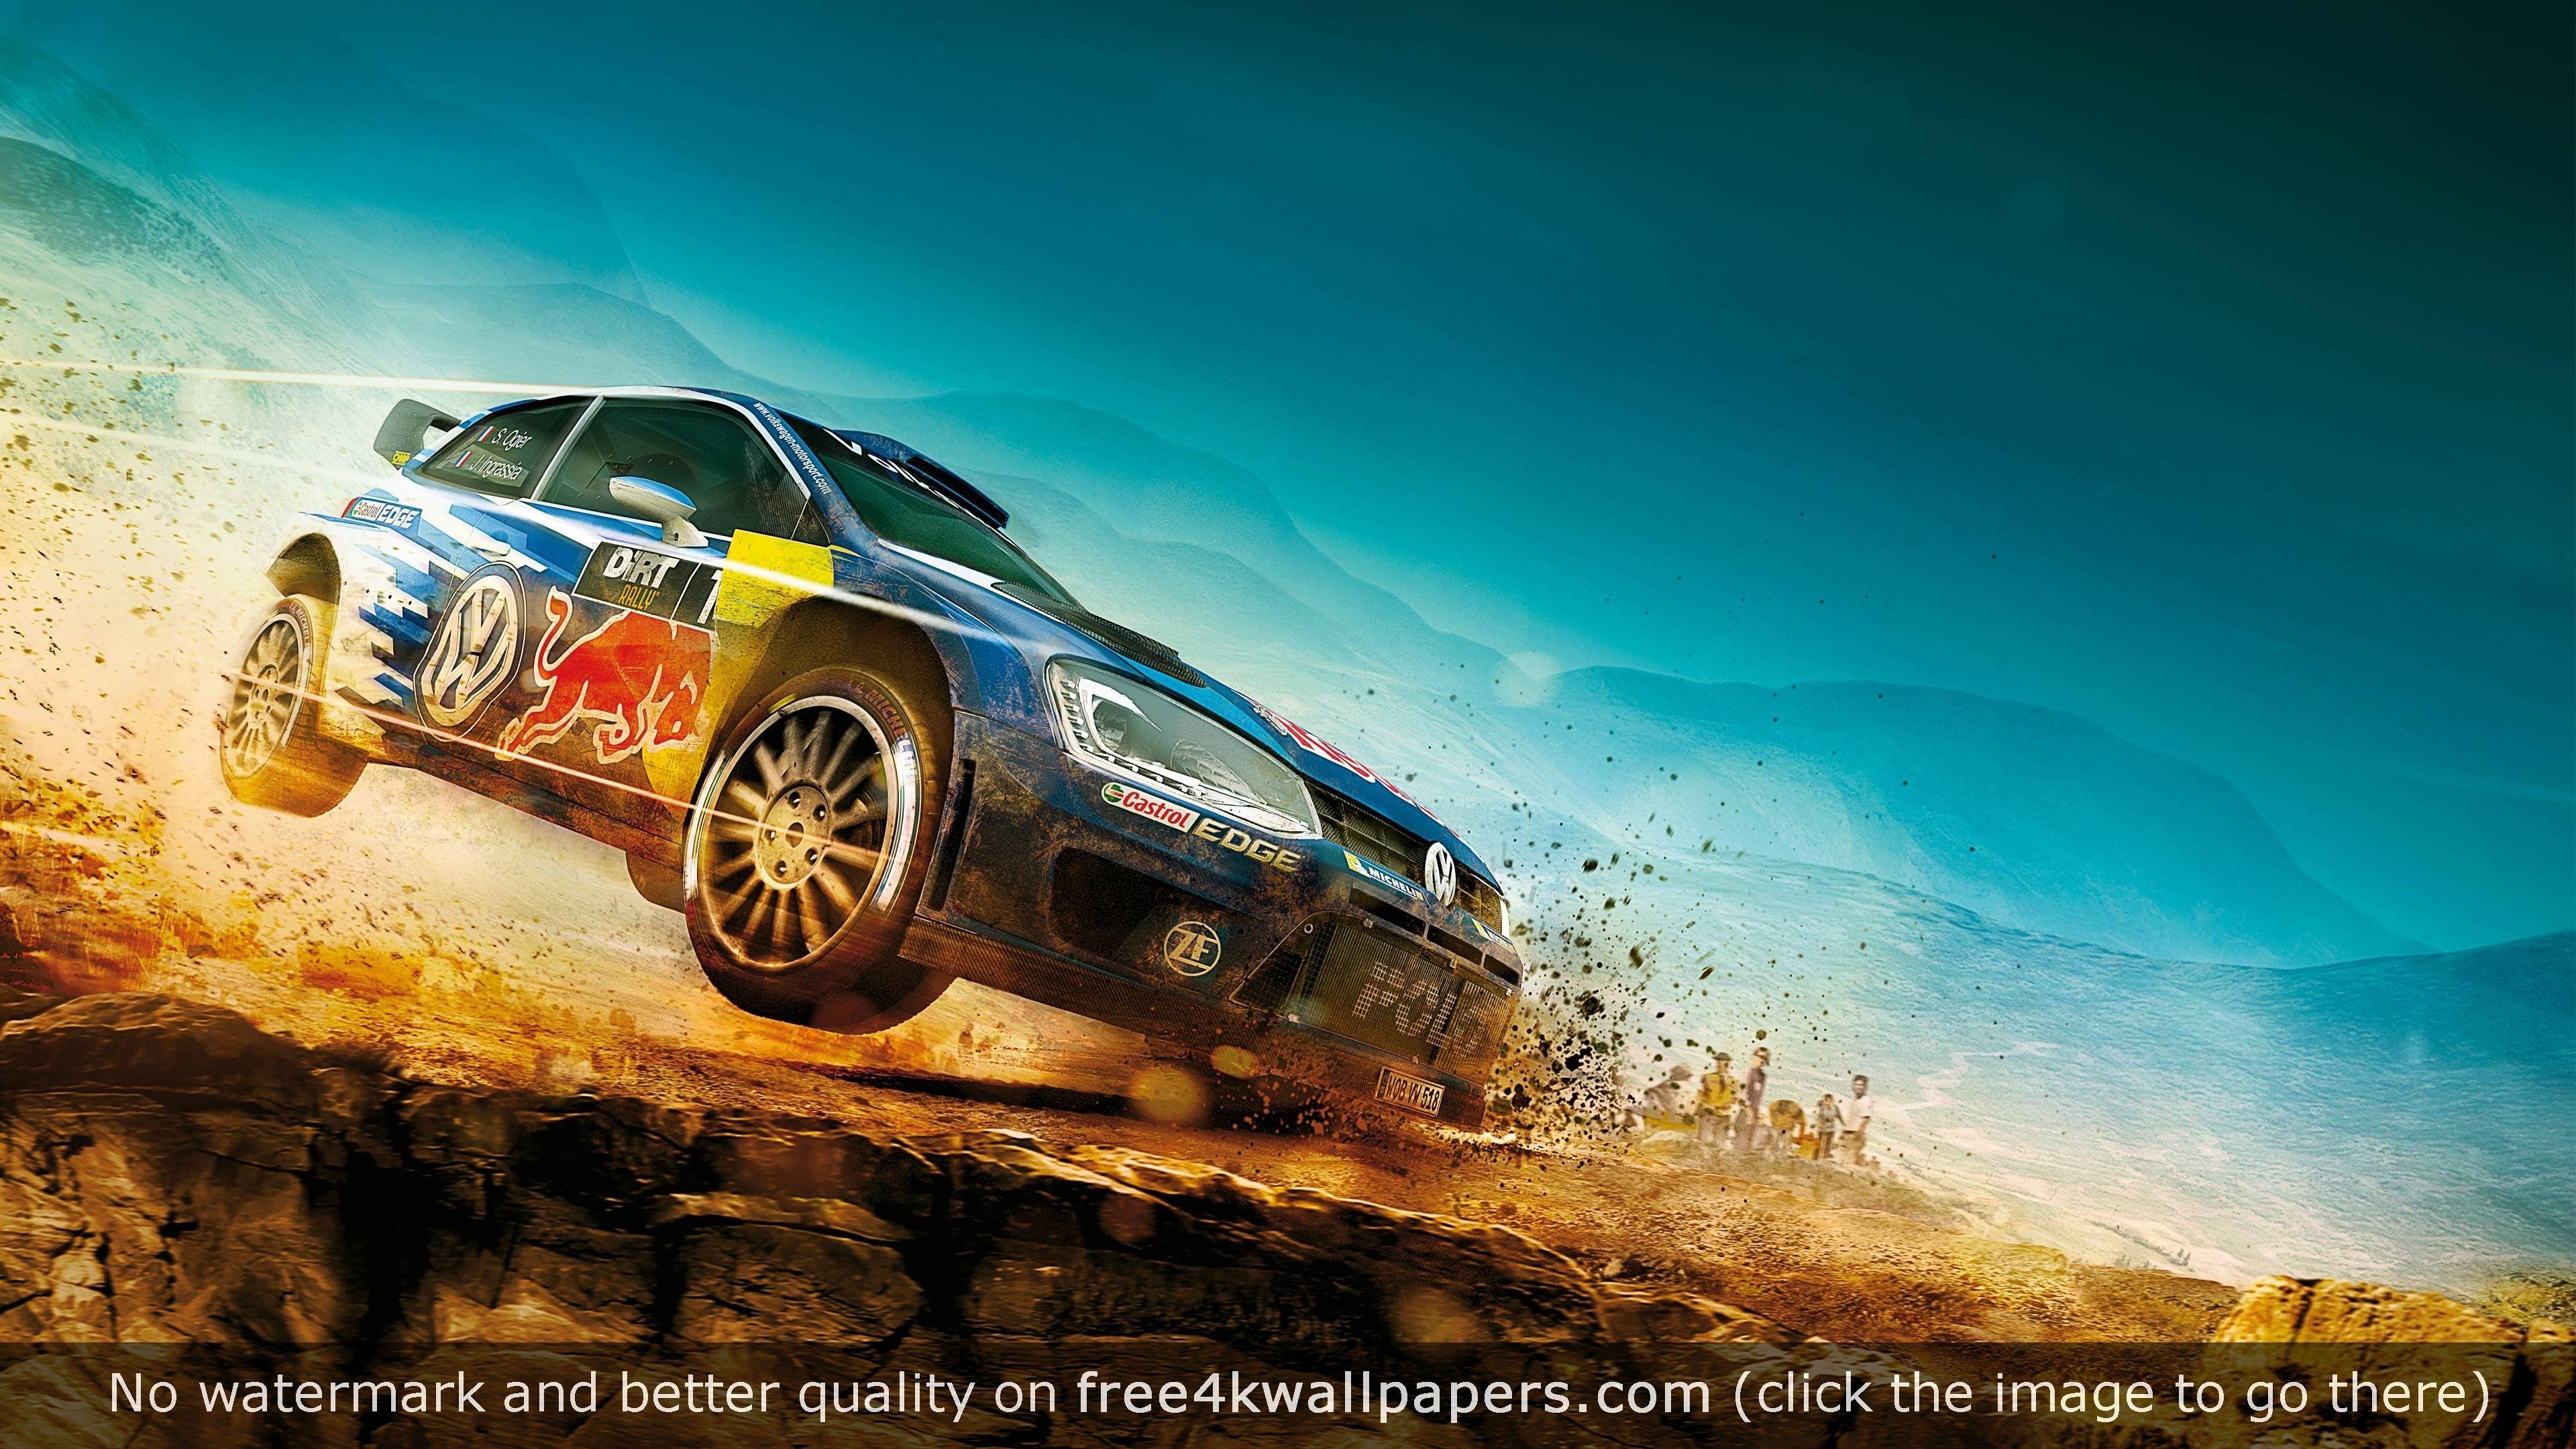 Car Flying Dirt Race Most Amazing Ultra Hd 4k Wallpaper Racing Car Hd Wallpaper